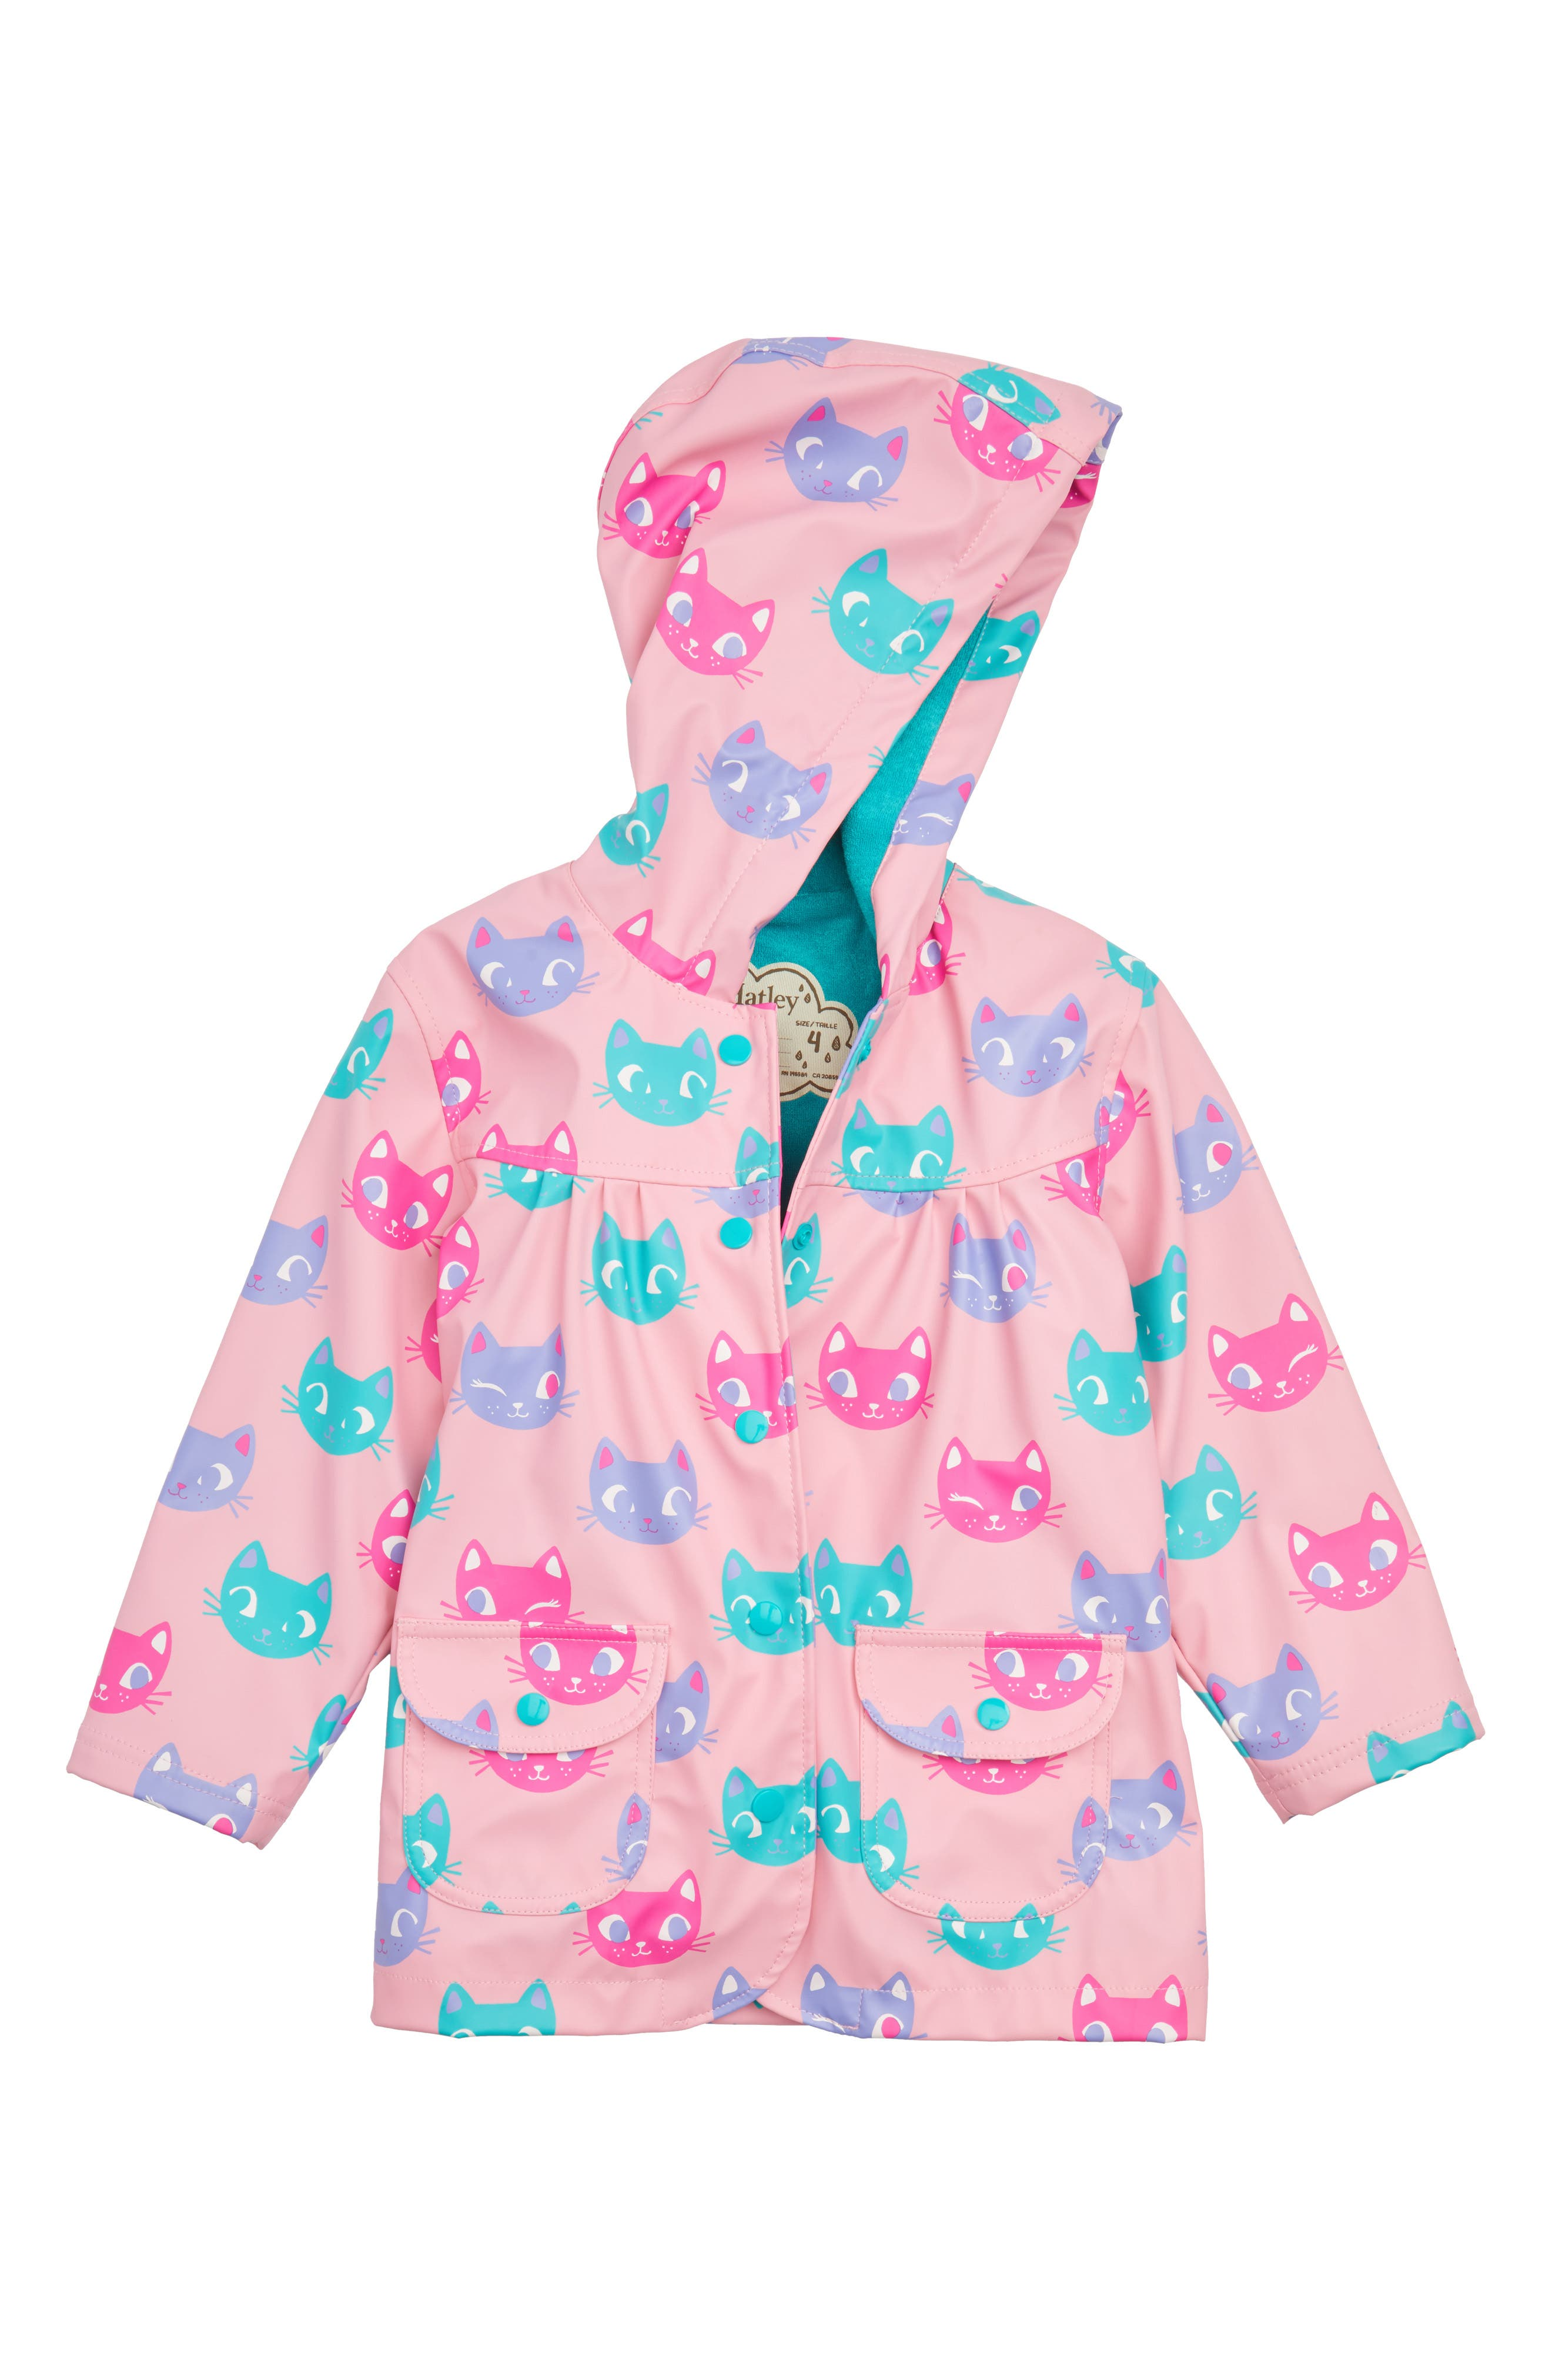 Silly Kitties Print Raincoat,                         Main,                         color, 550